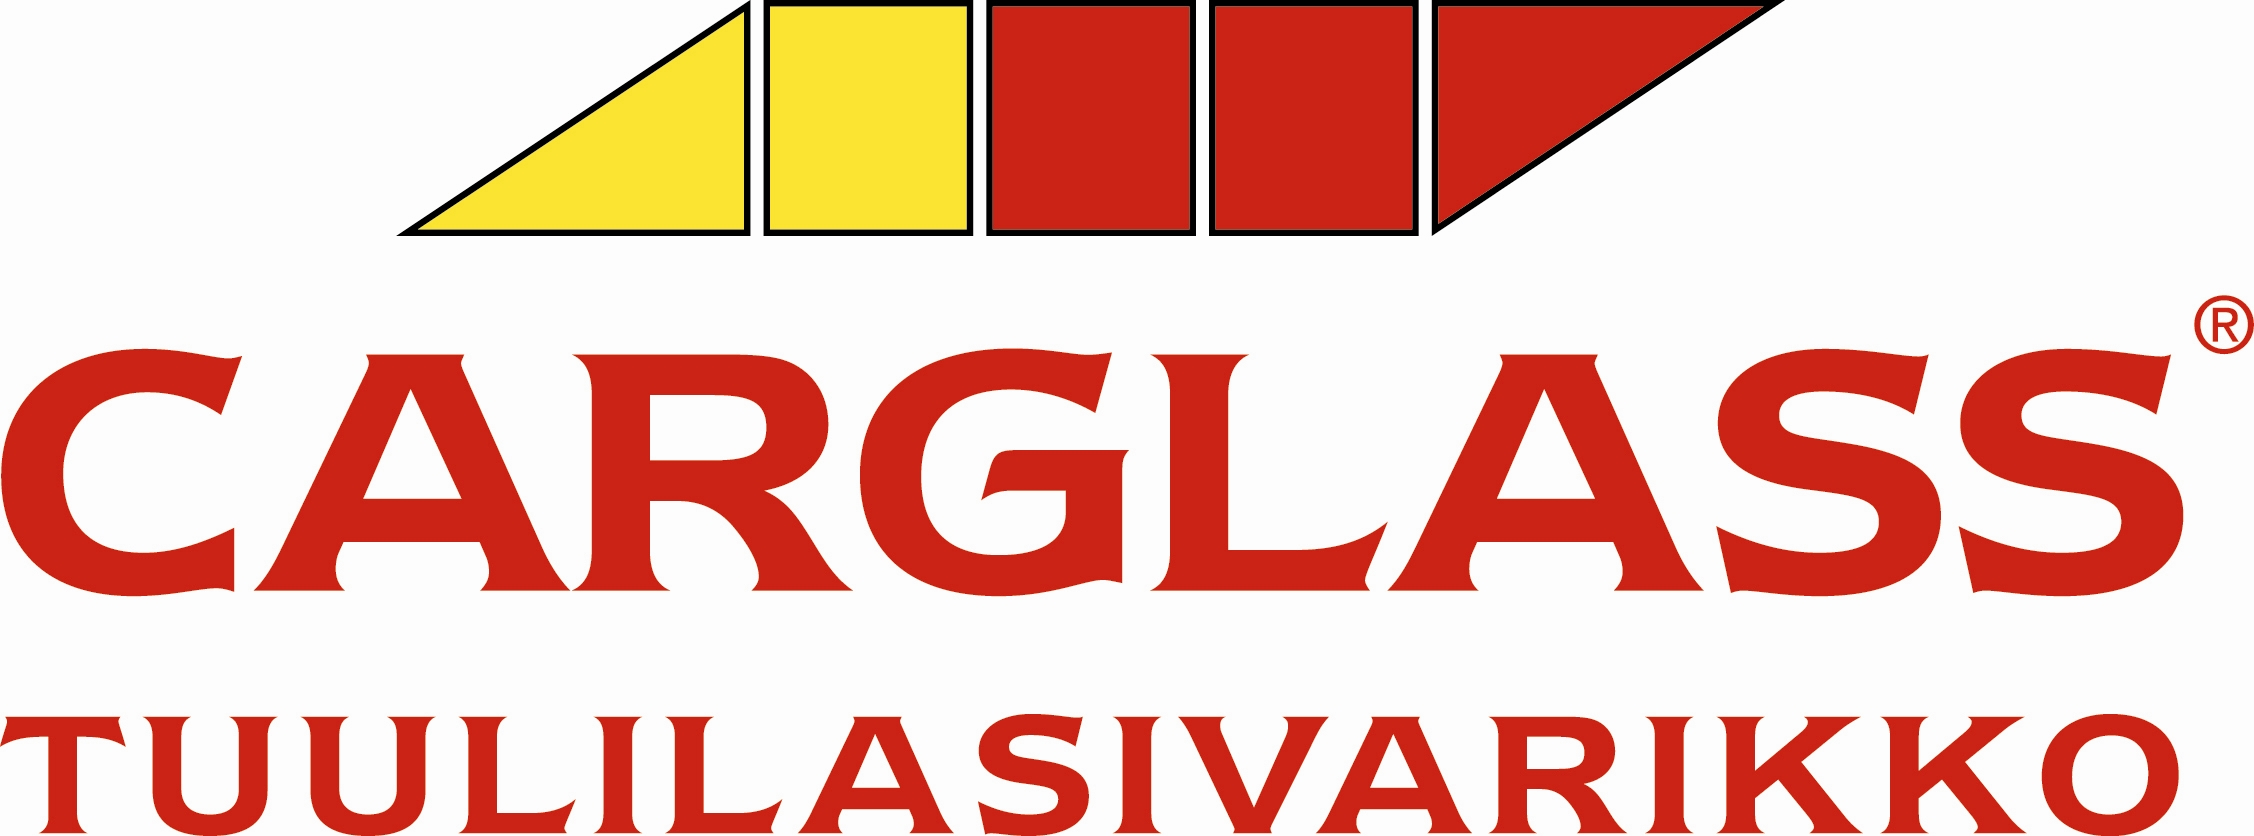 Logo Carglass TUULILASIVARIKKO